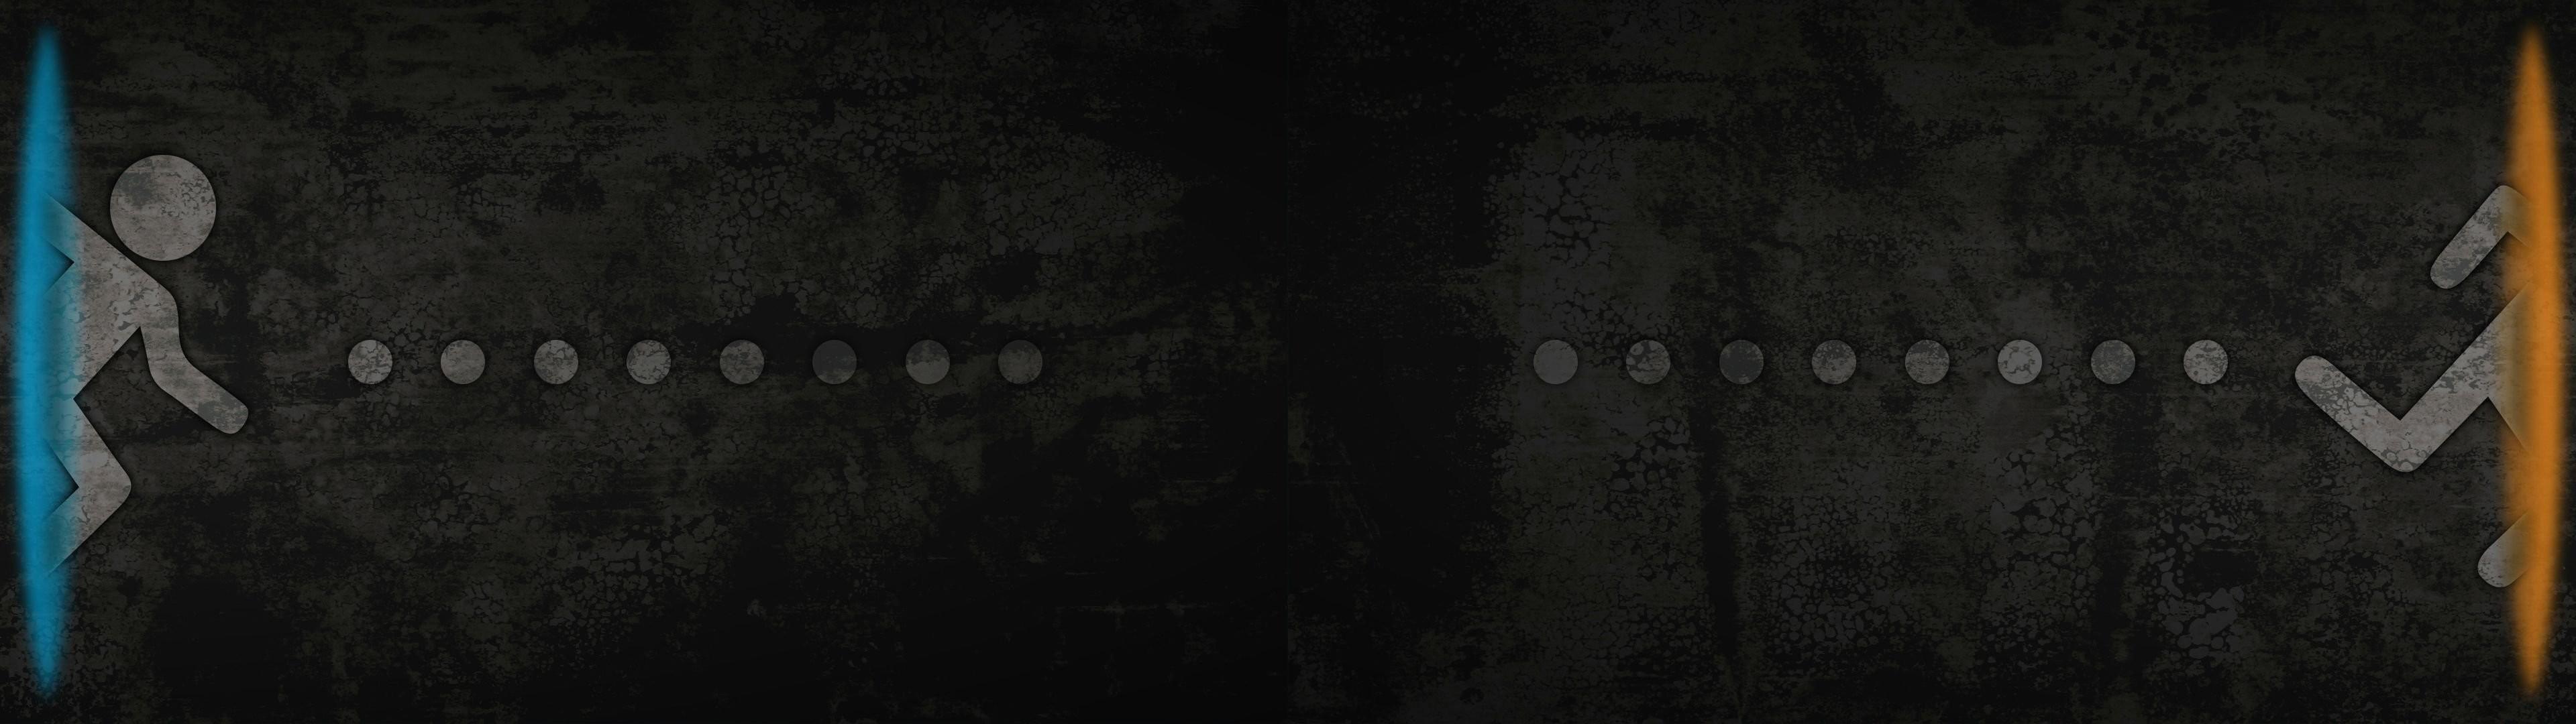 Dual monitor wallpapers anyone? – Album on Imgur